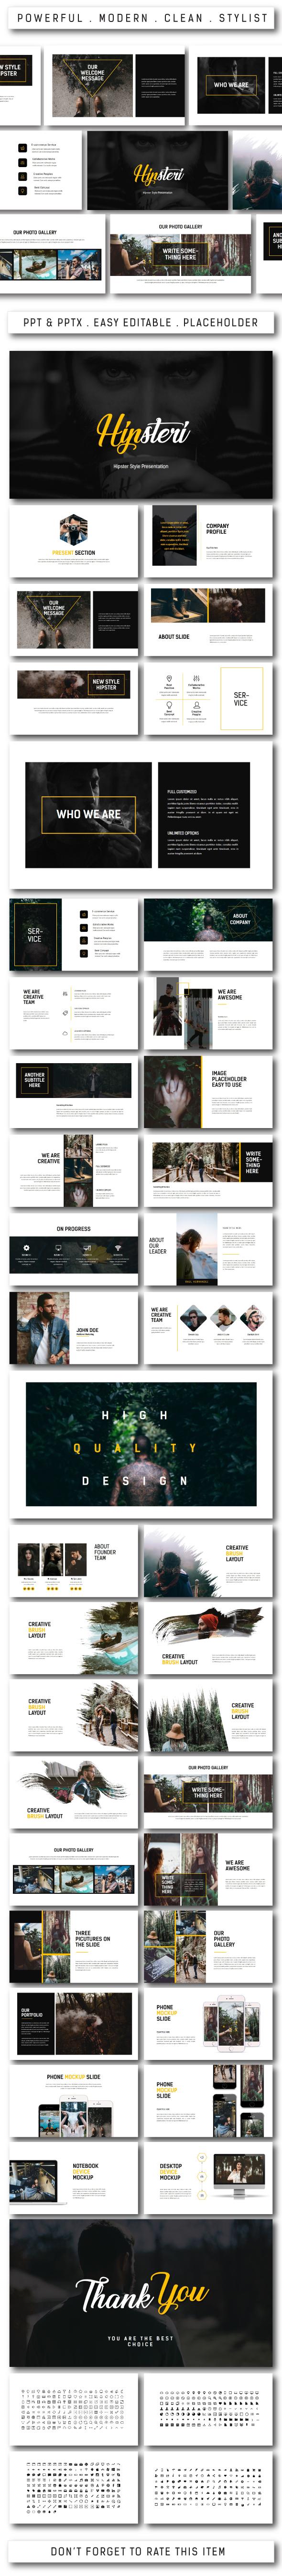 Hipsteri Multipurpose Powerpoint - PowerPoint Templates Presentation Templates